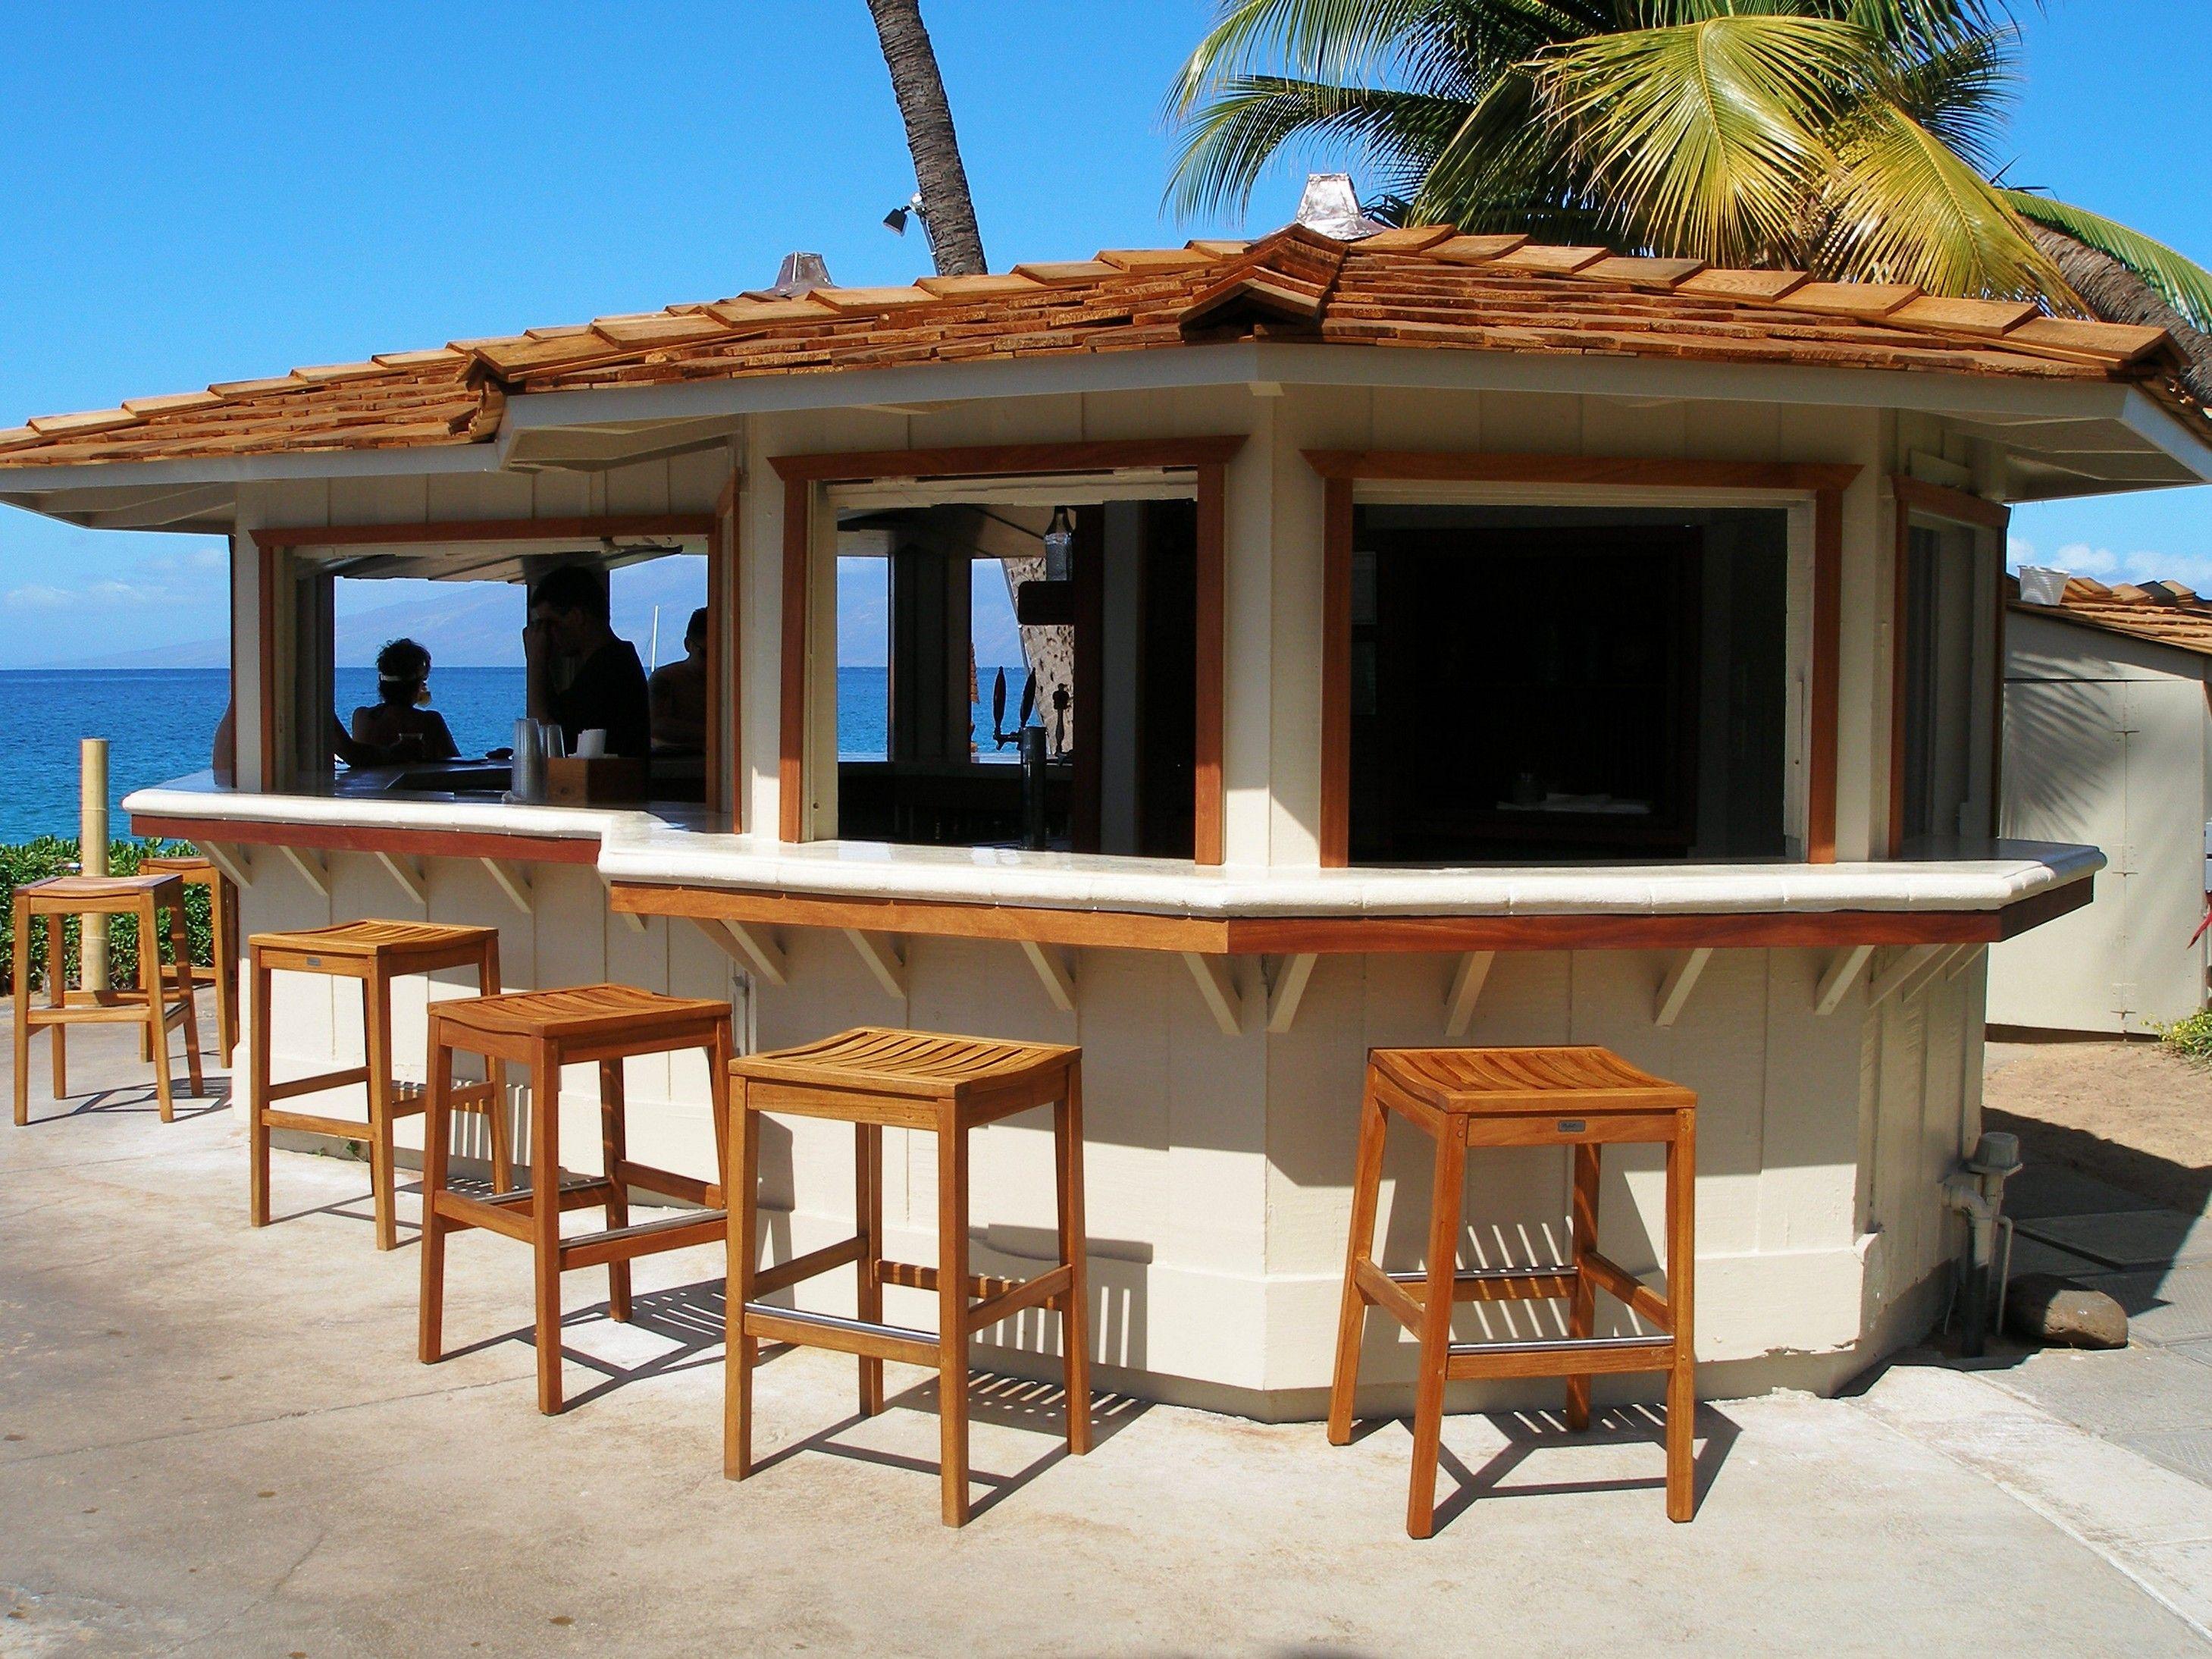 Creative Patio Outdoor Bar Ideas You Must Try At Your Backyard Minimalis Backyard modern outdoor bar ideas